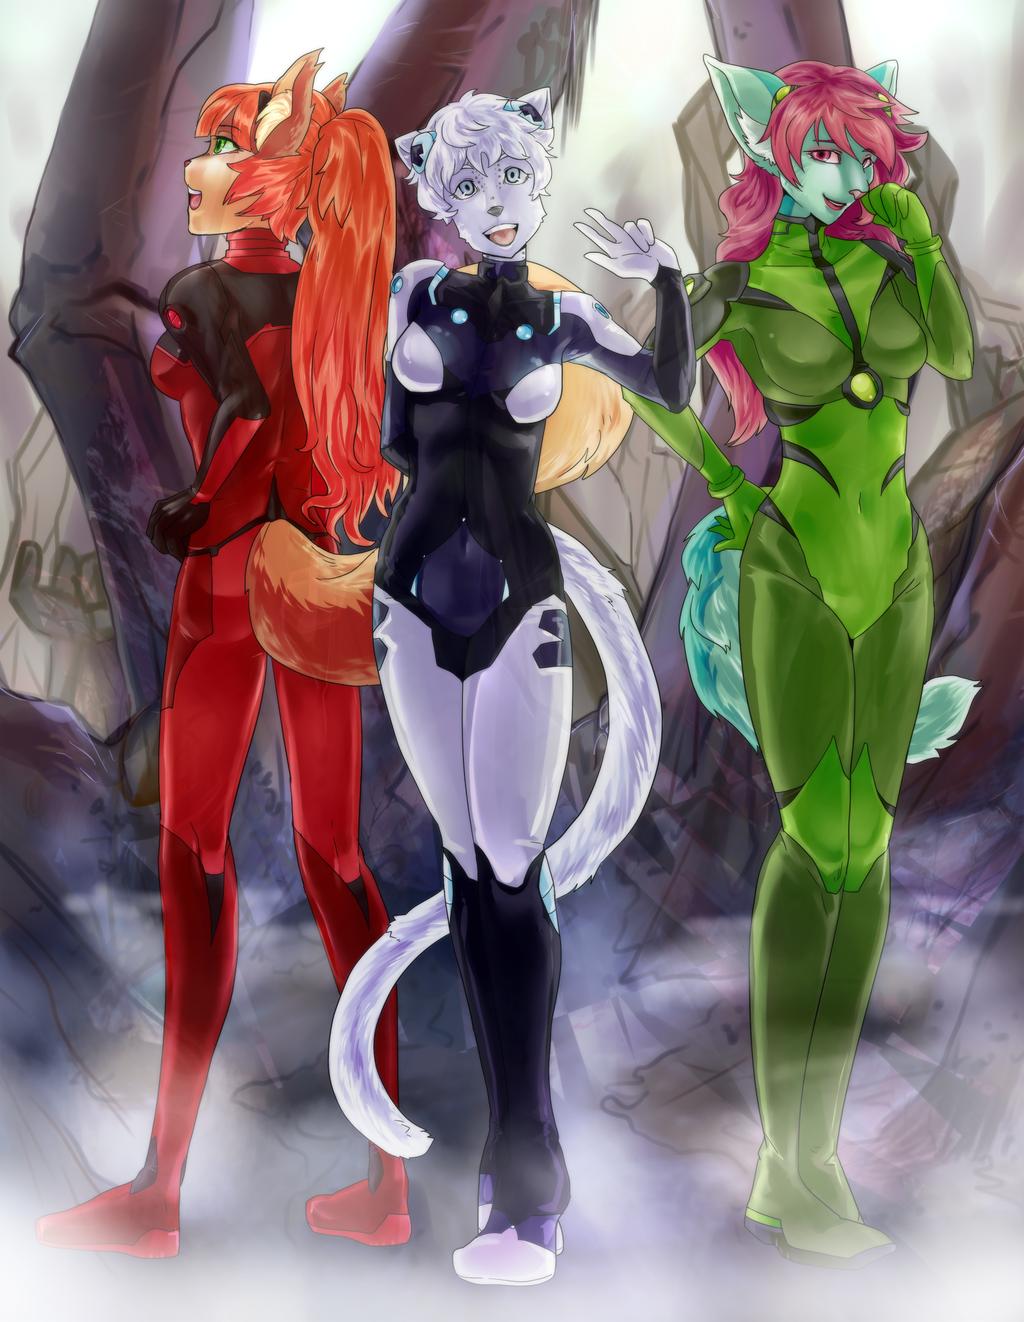 Most recent image: Furry Genesis Evangelion by AppendageChild